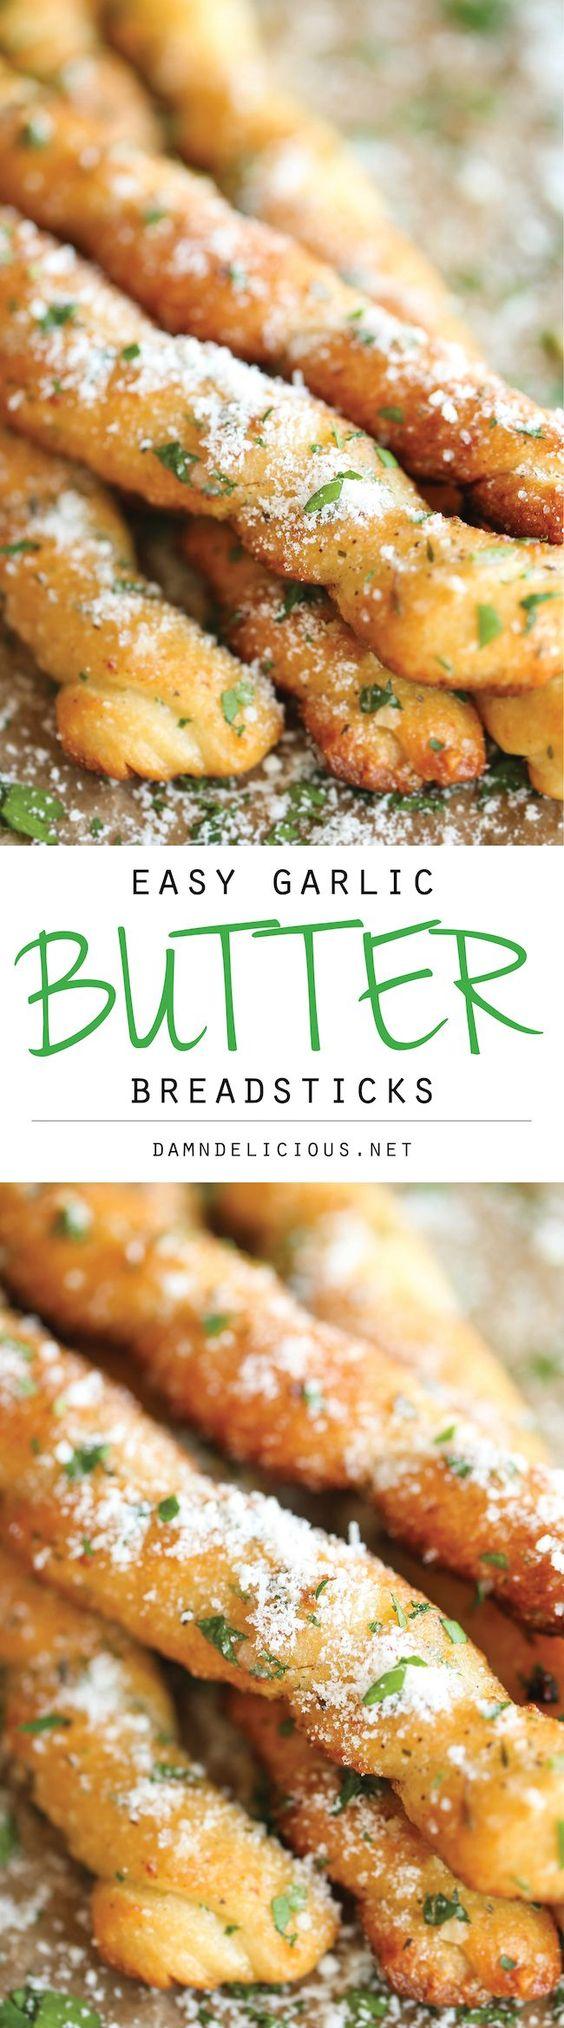 Easy Garlic Butter Breadsticks Recipe Garlic butter